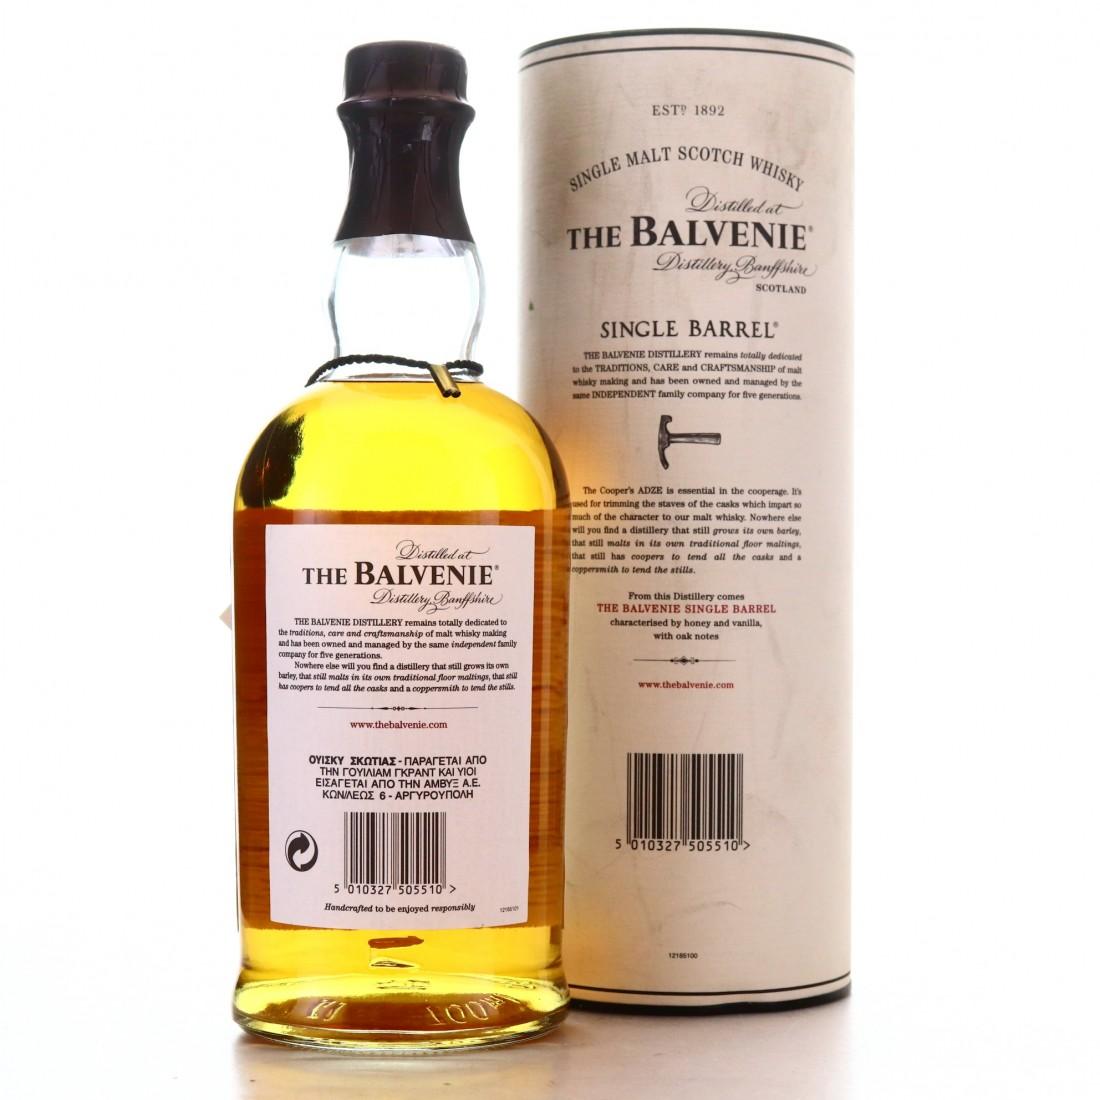 Balvenie 1993 Single Barrel 15 Year Old #8737